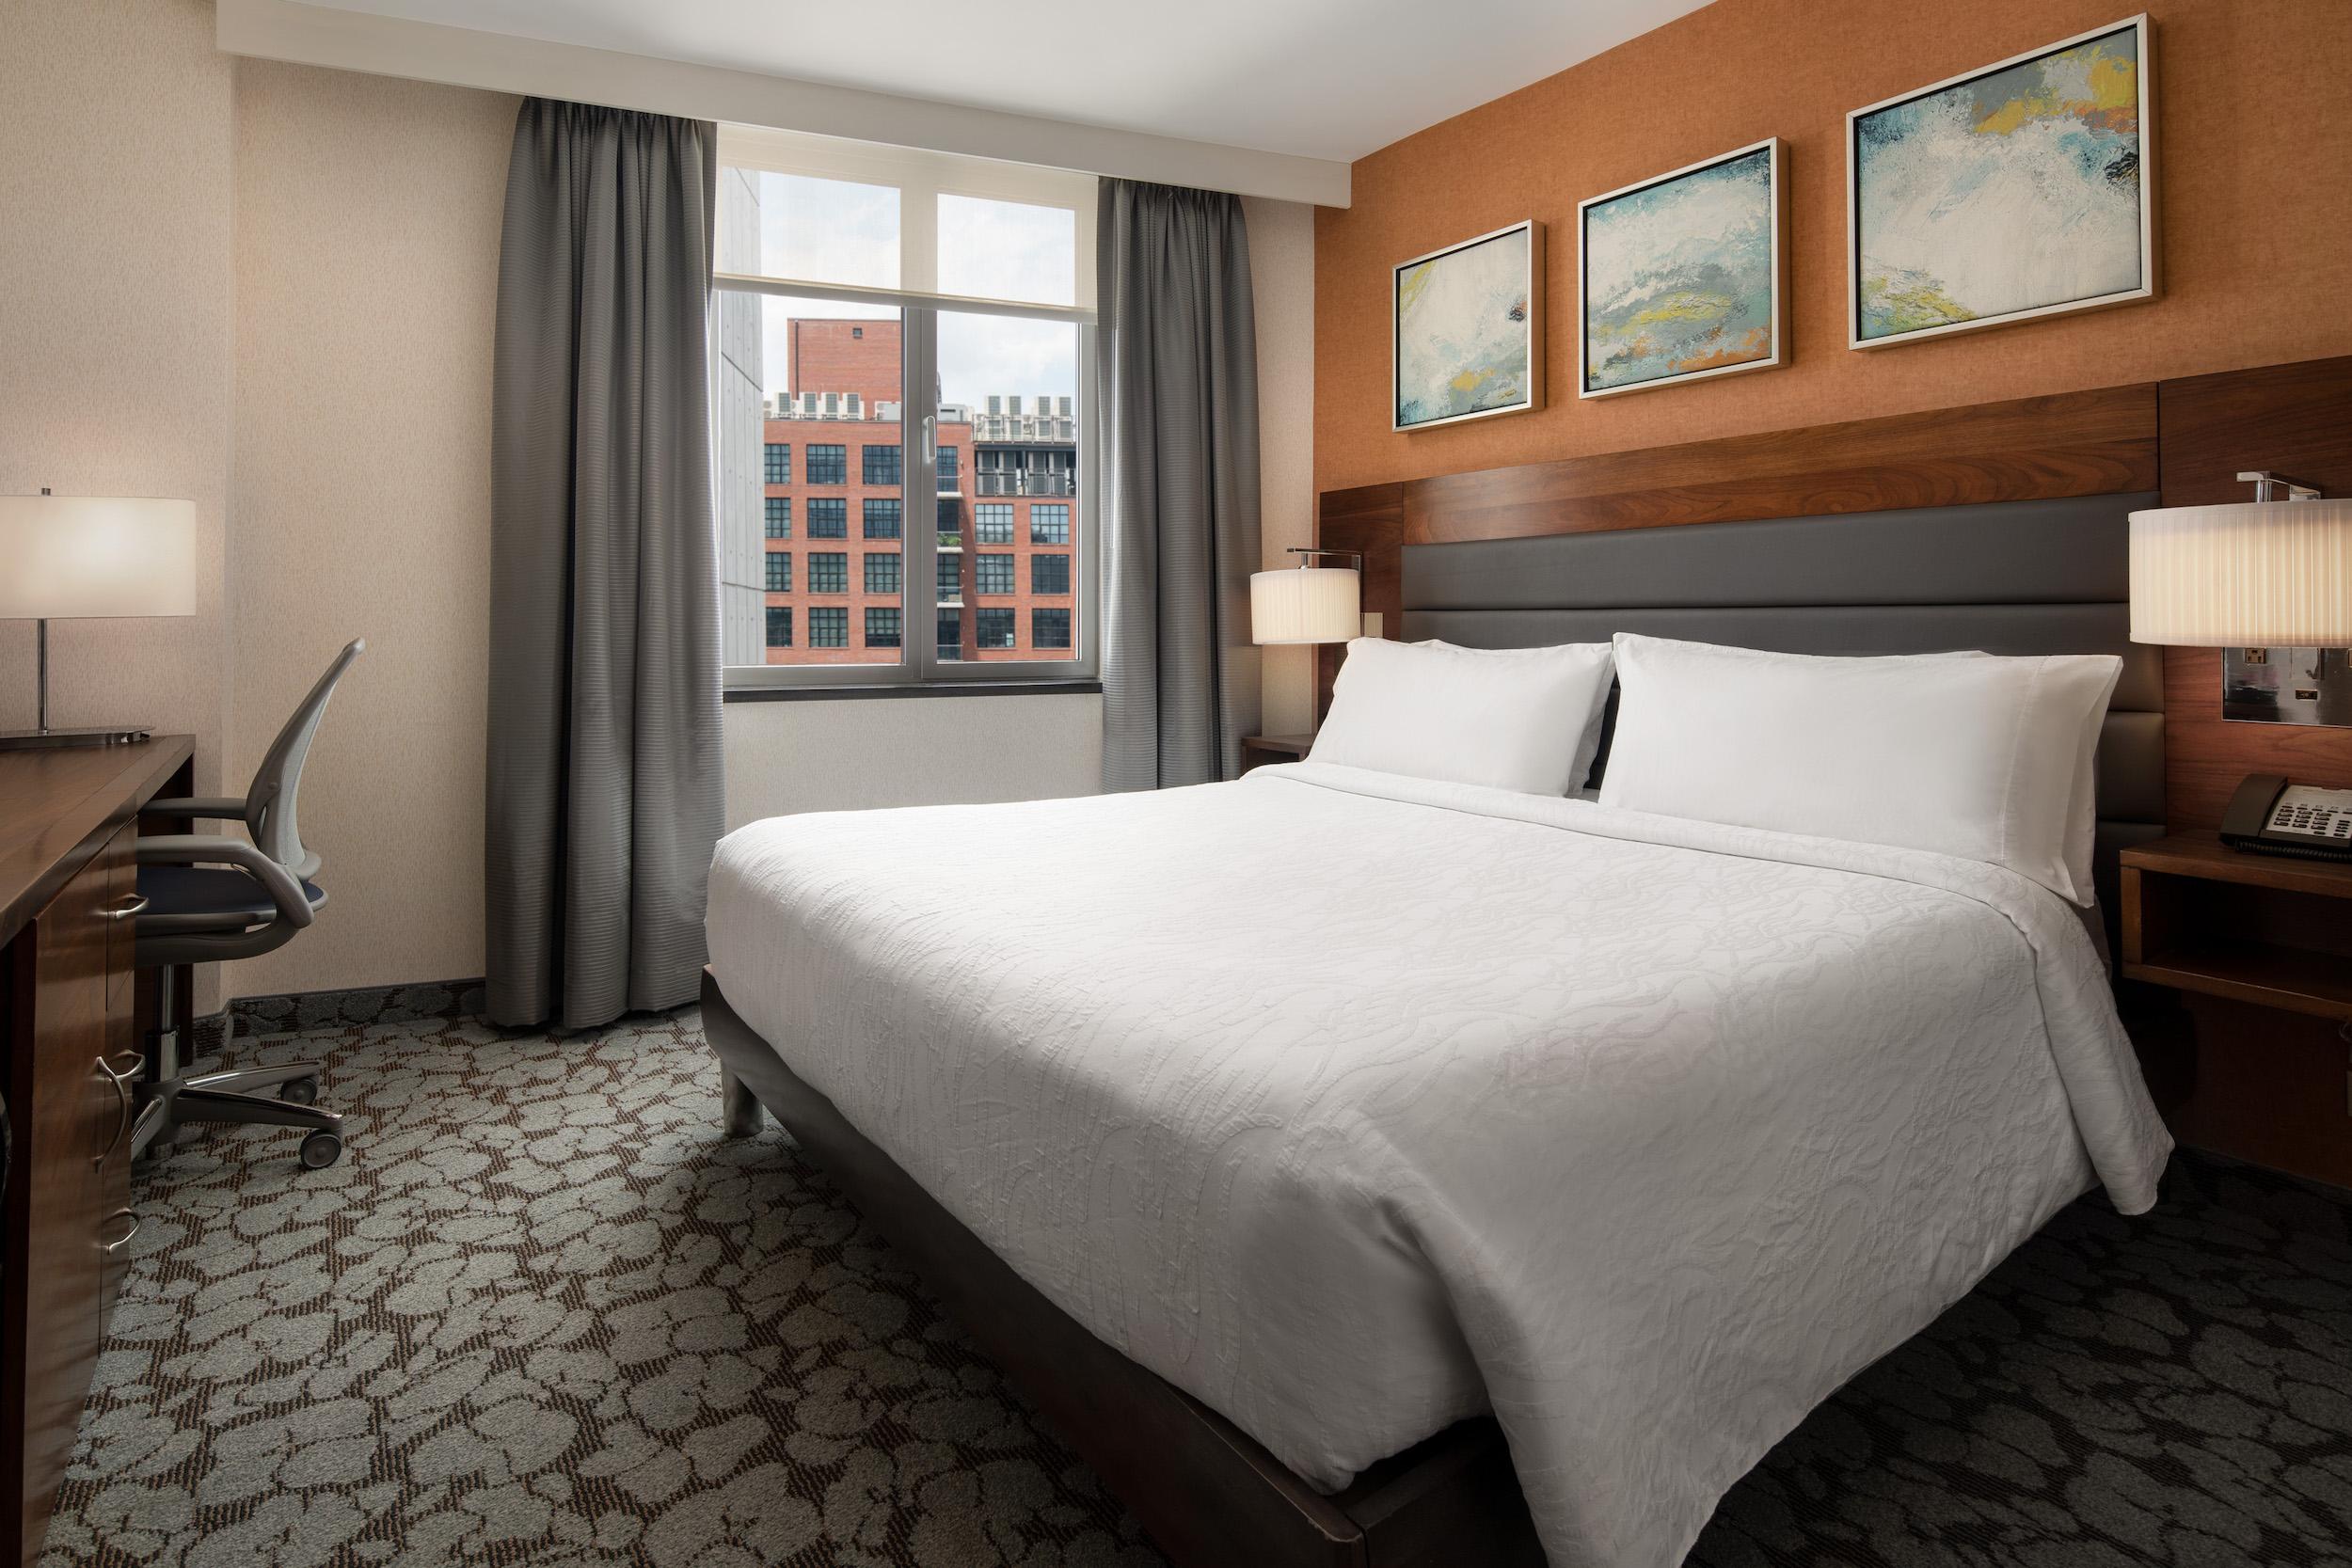 ISPIC_HGI_LIC_Standard_King_Room